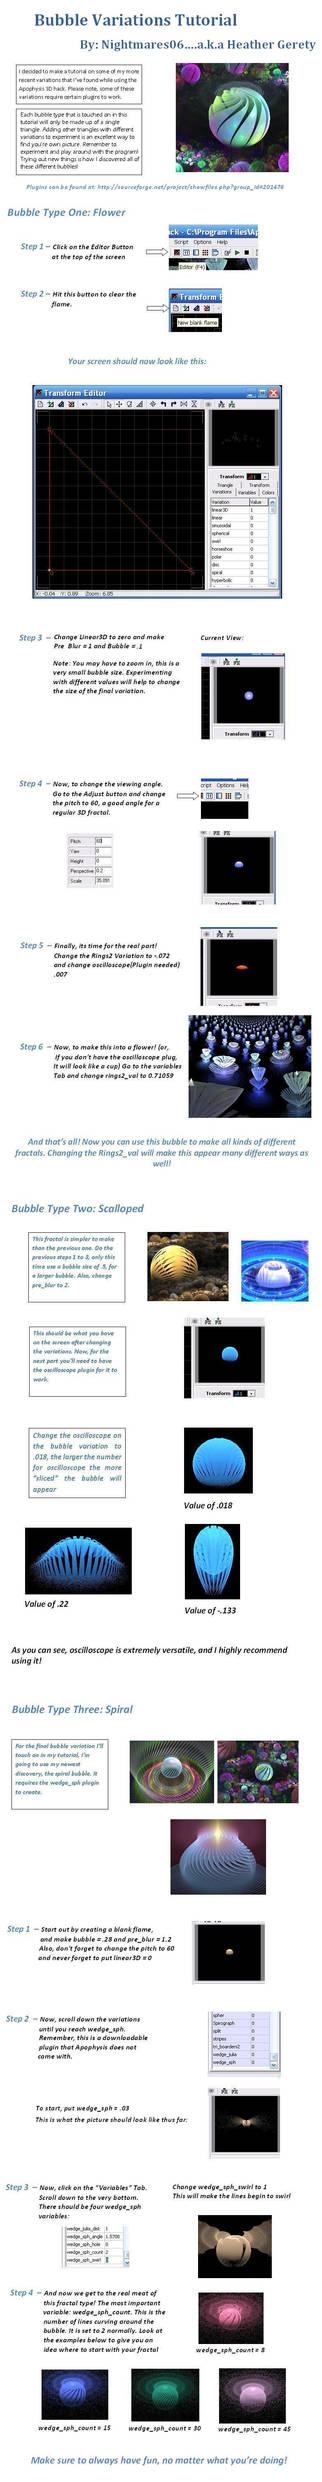 Bubble Variation Tutorial